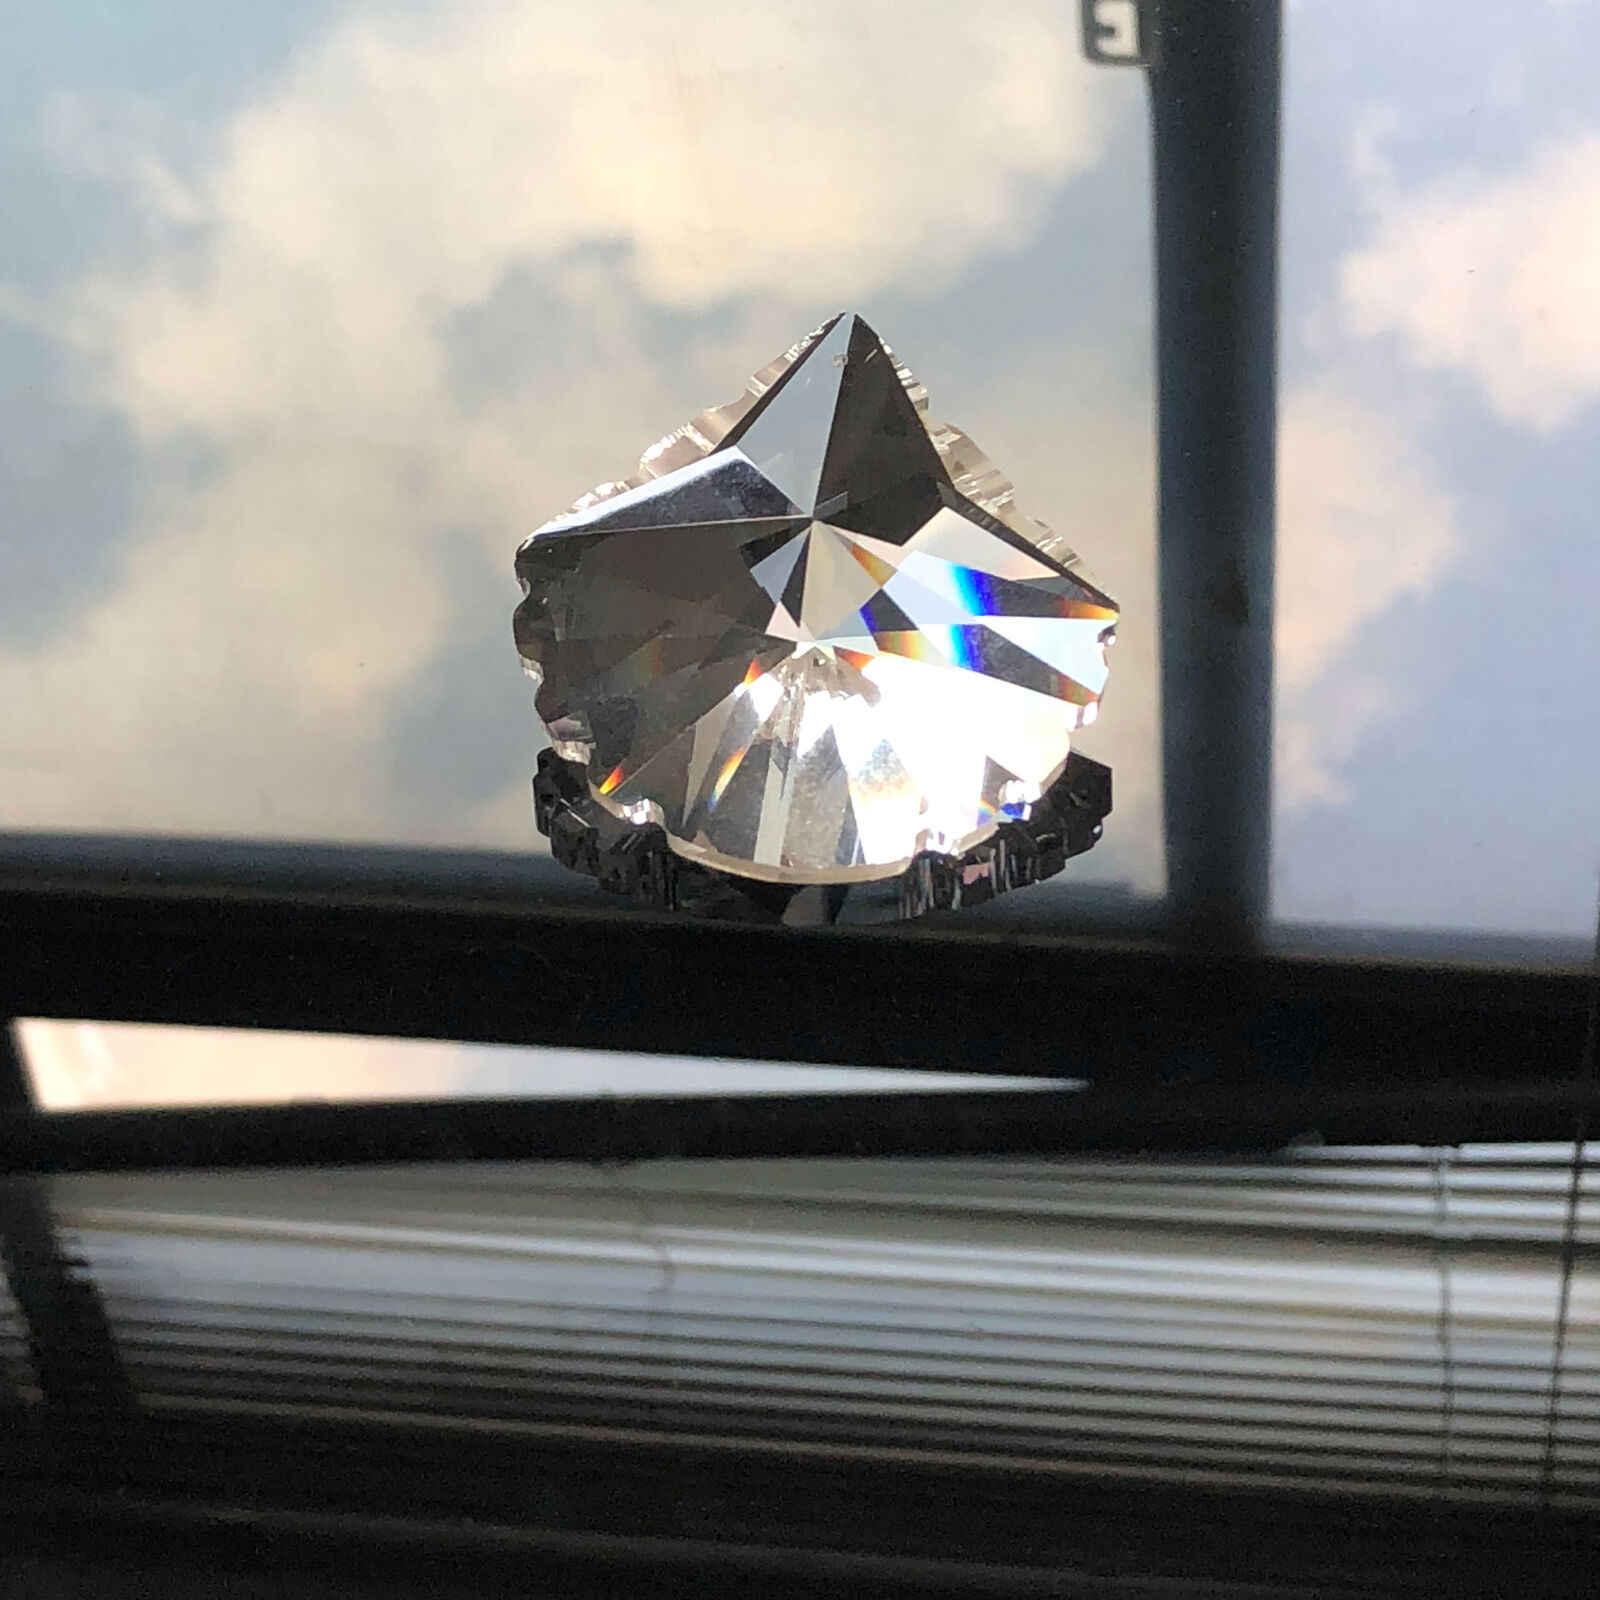 1X צדפות פגז Suncatcher מנסרות פיאות זכוכית אמנות קישוט נברשת קריסטל חלק תליית תליון DIY מסיבת מנורת אספקת